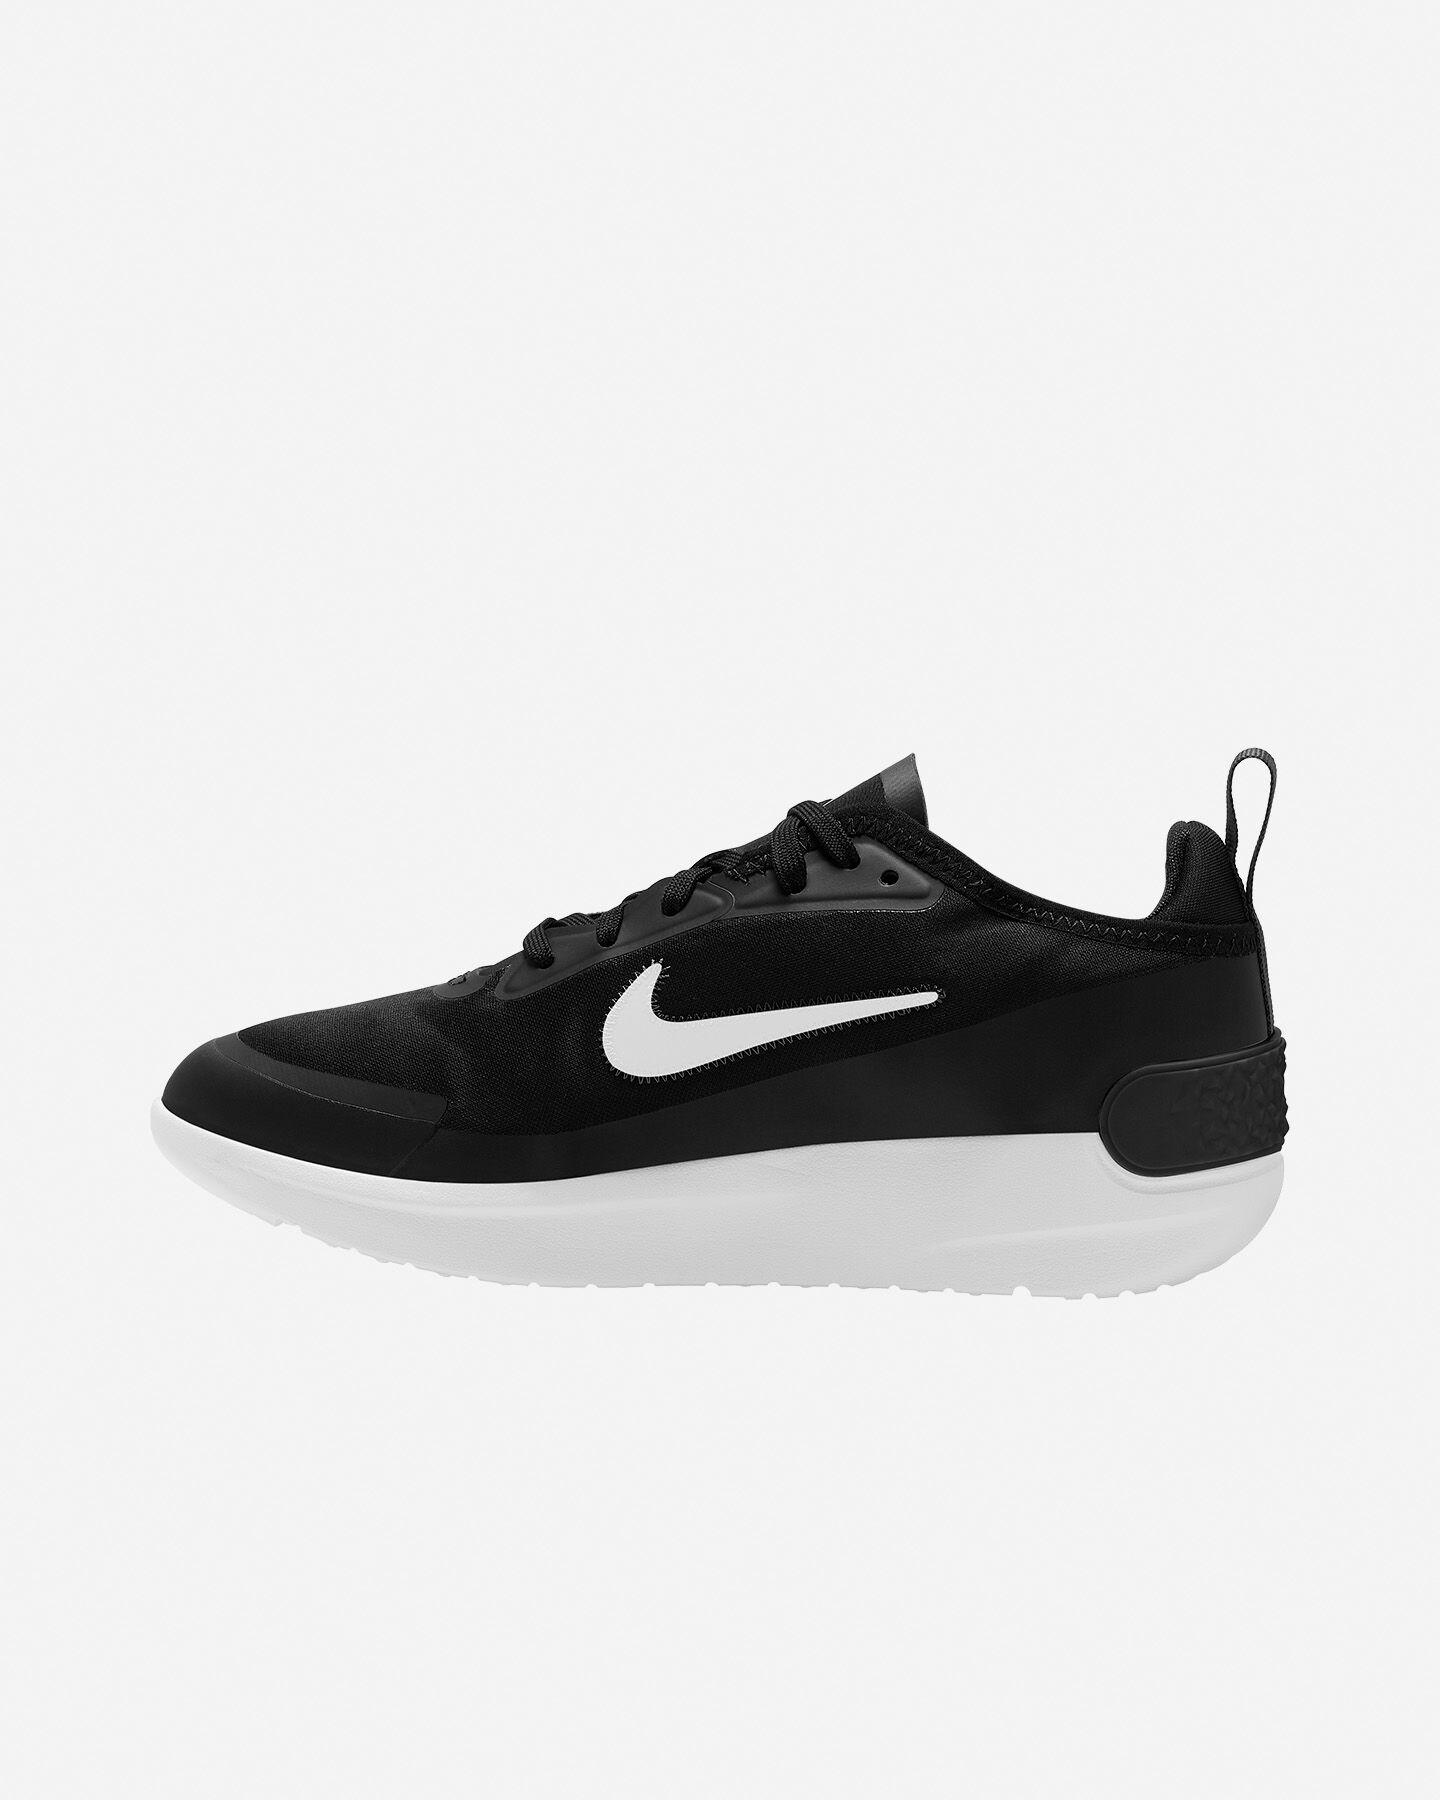 Scarpe sneakers NIKE AMIXA W S5162041 scatto 2